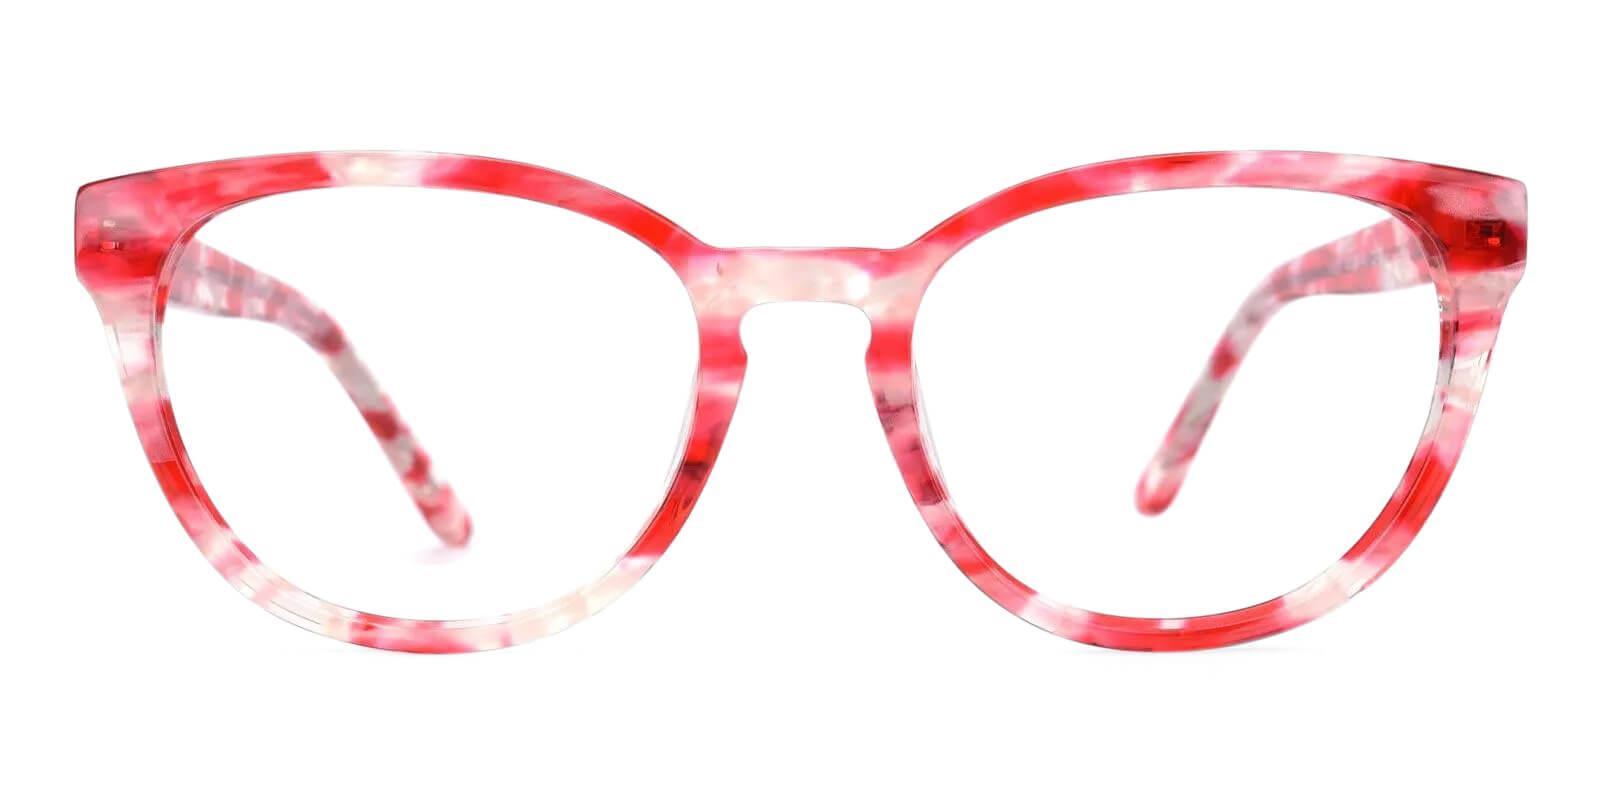 Quauetom Red Acetate Eyeglasses , Fashion , SpringHinges , UniversalBridgeFit Frames from ABBE Glasses